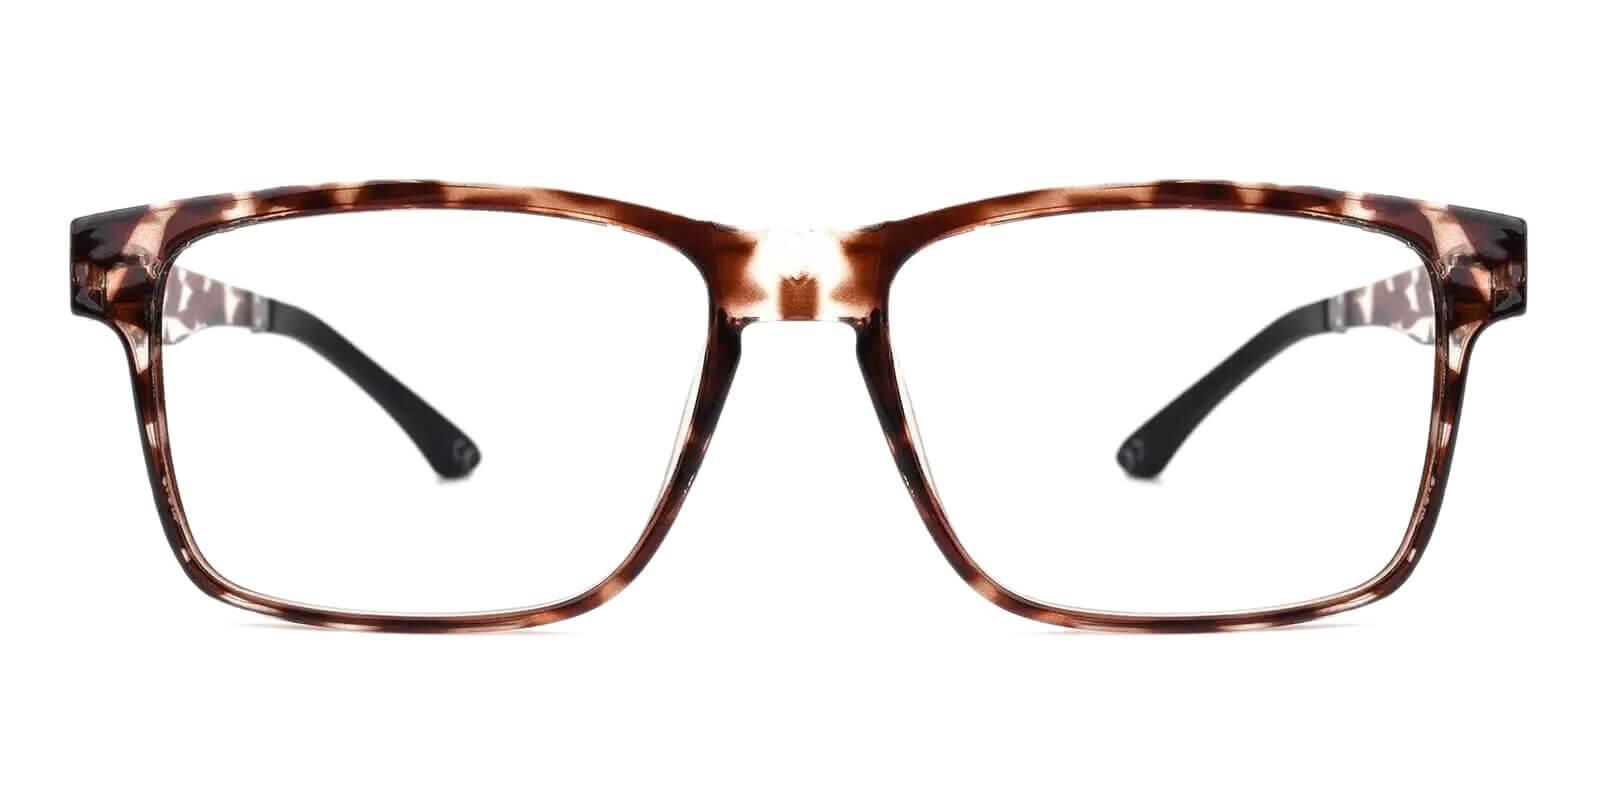 Austria Pattern Combination UniversalBridgeFit , Eyeglasses Frames from ABBE Glasses